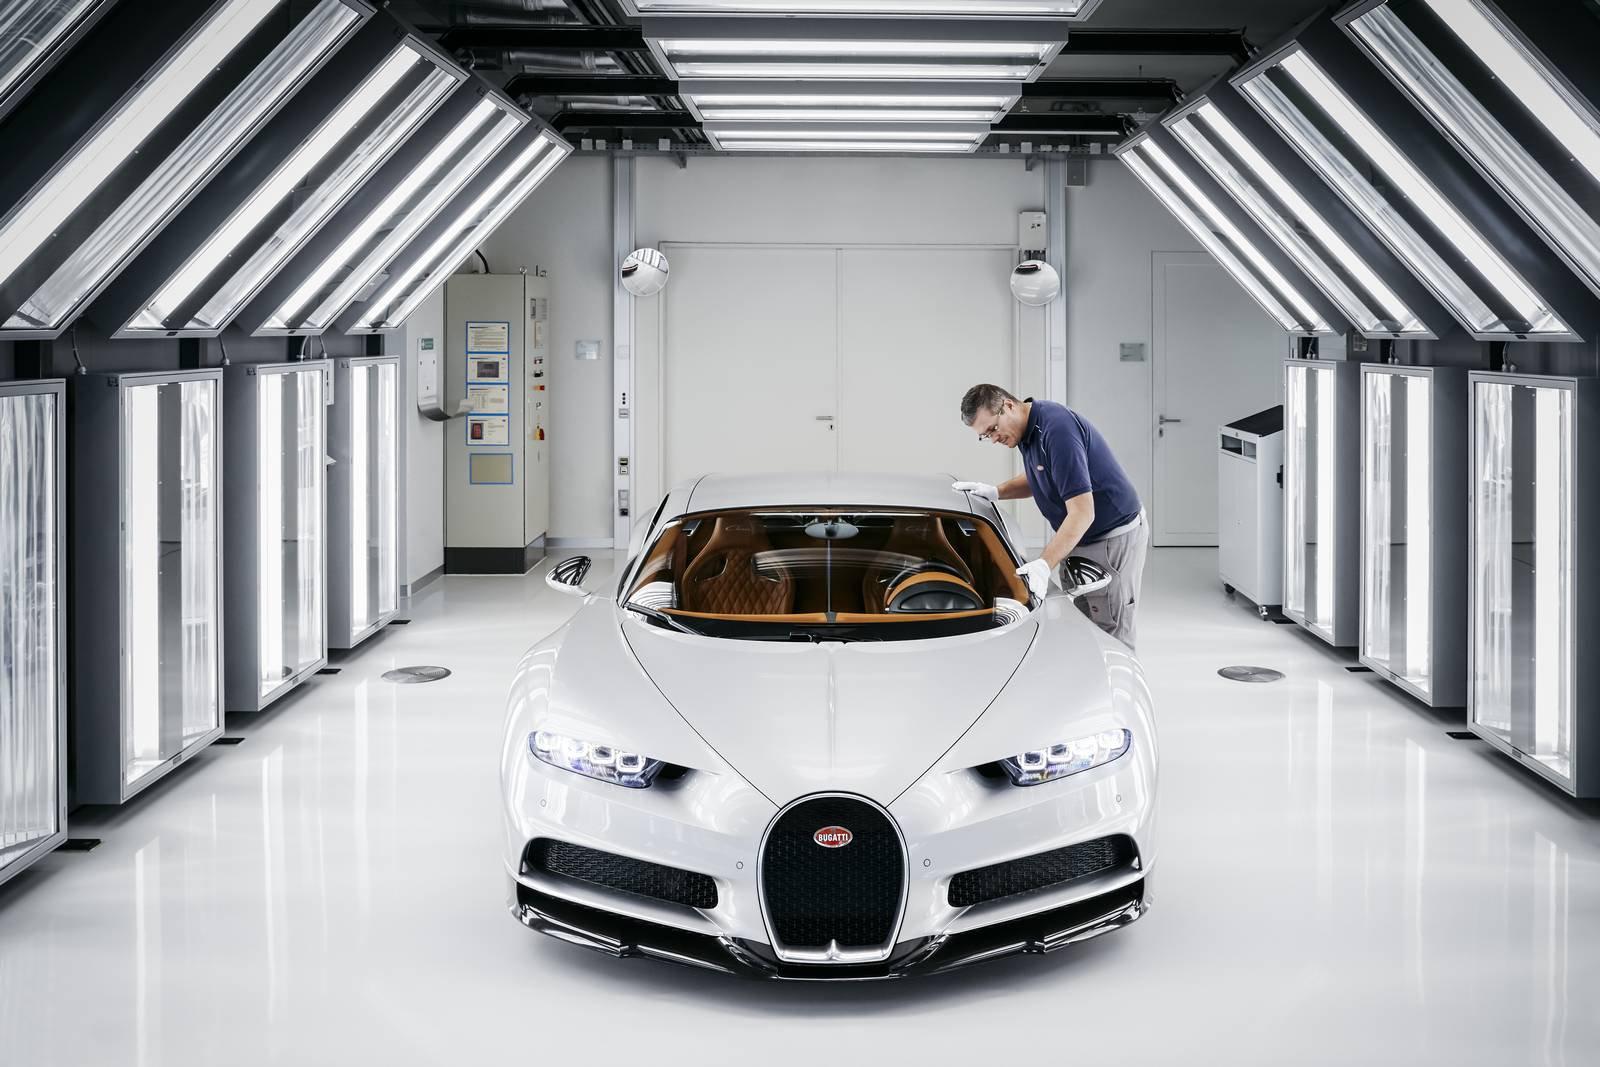 Bugatti Chiron production plant factory (14)